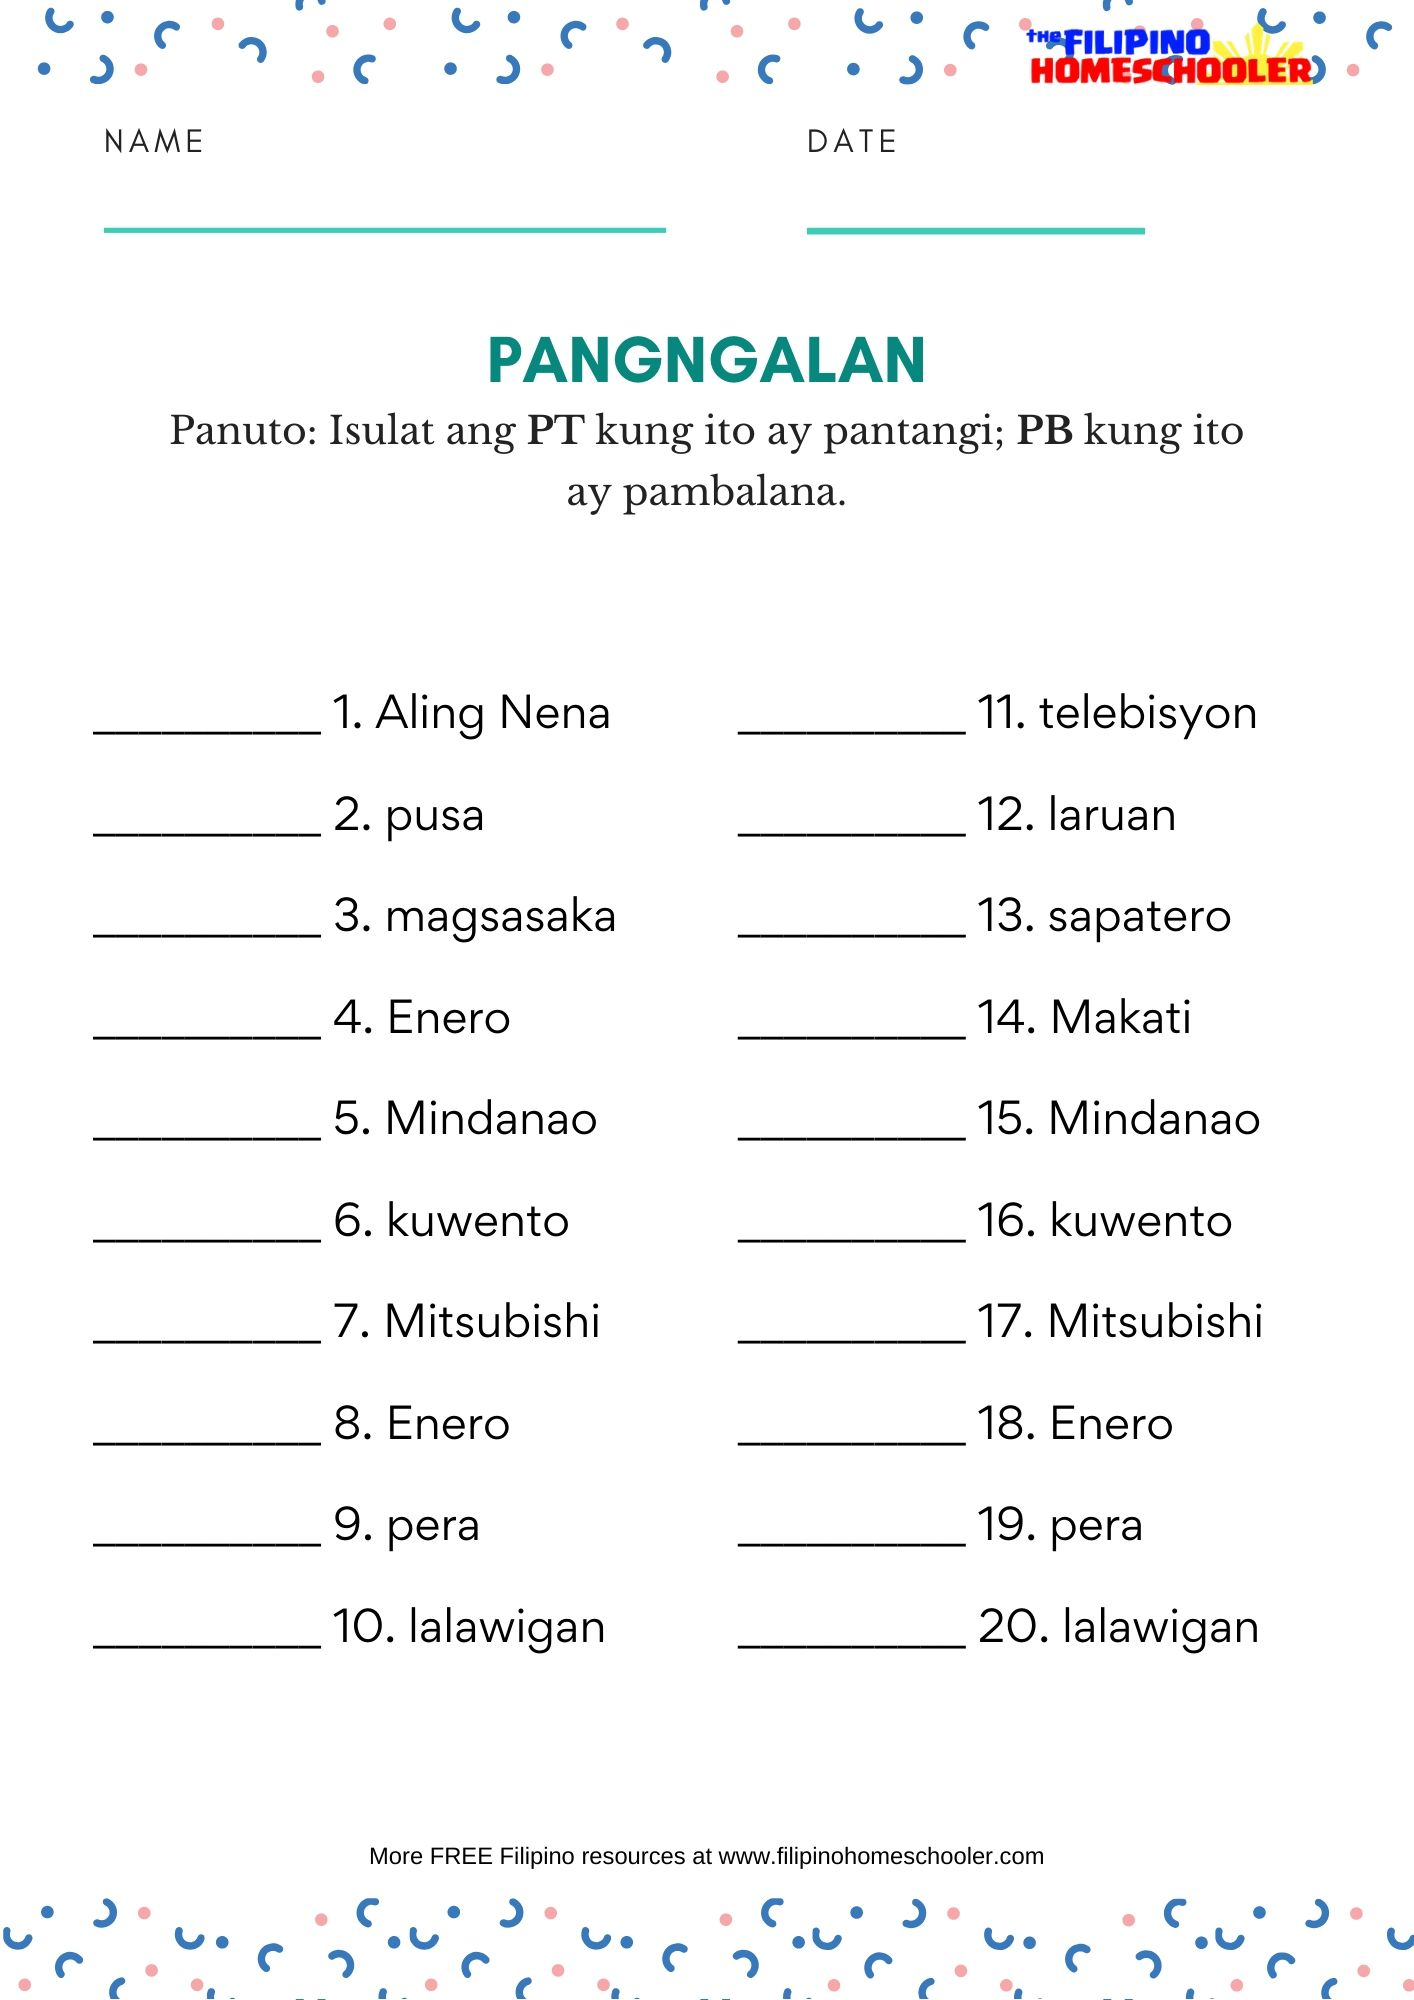 hight resolution of Worksheet For Grade 4 Araling Panlipunan   Printable Worksheets and  Activities for Teachers